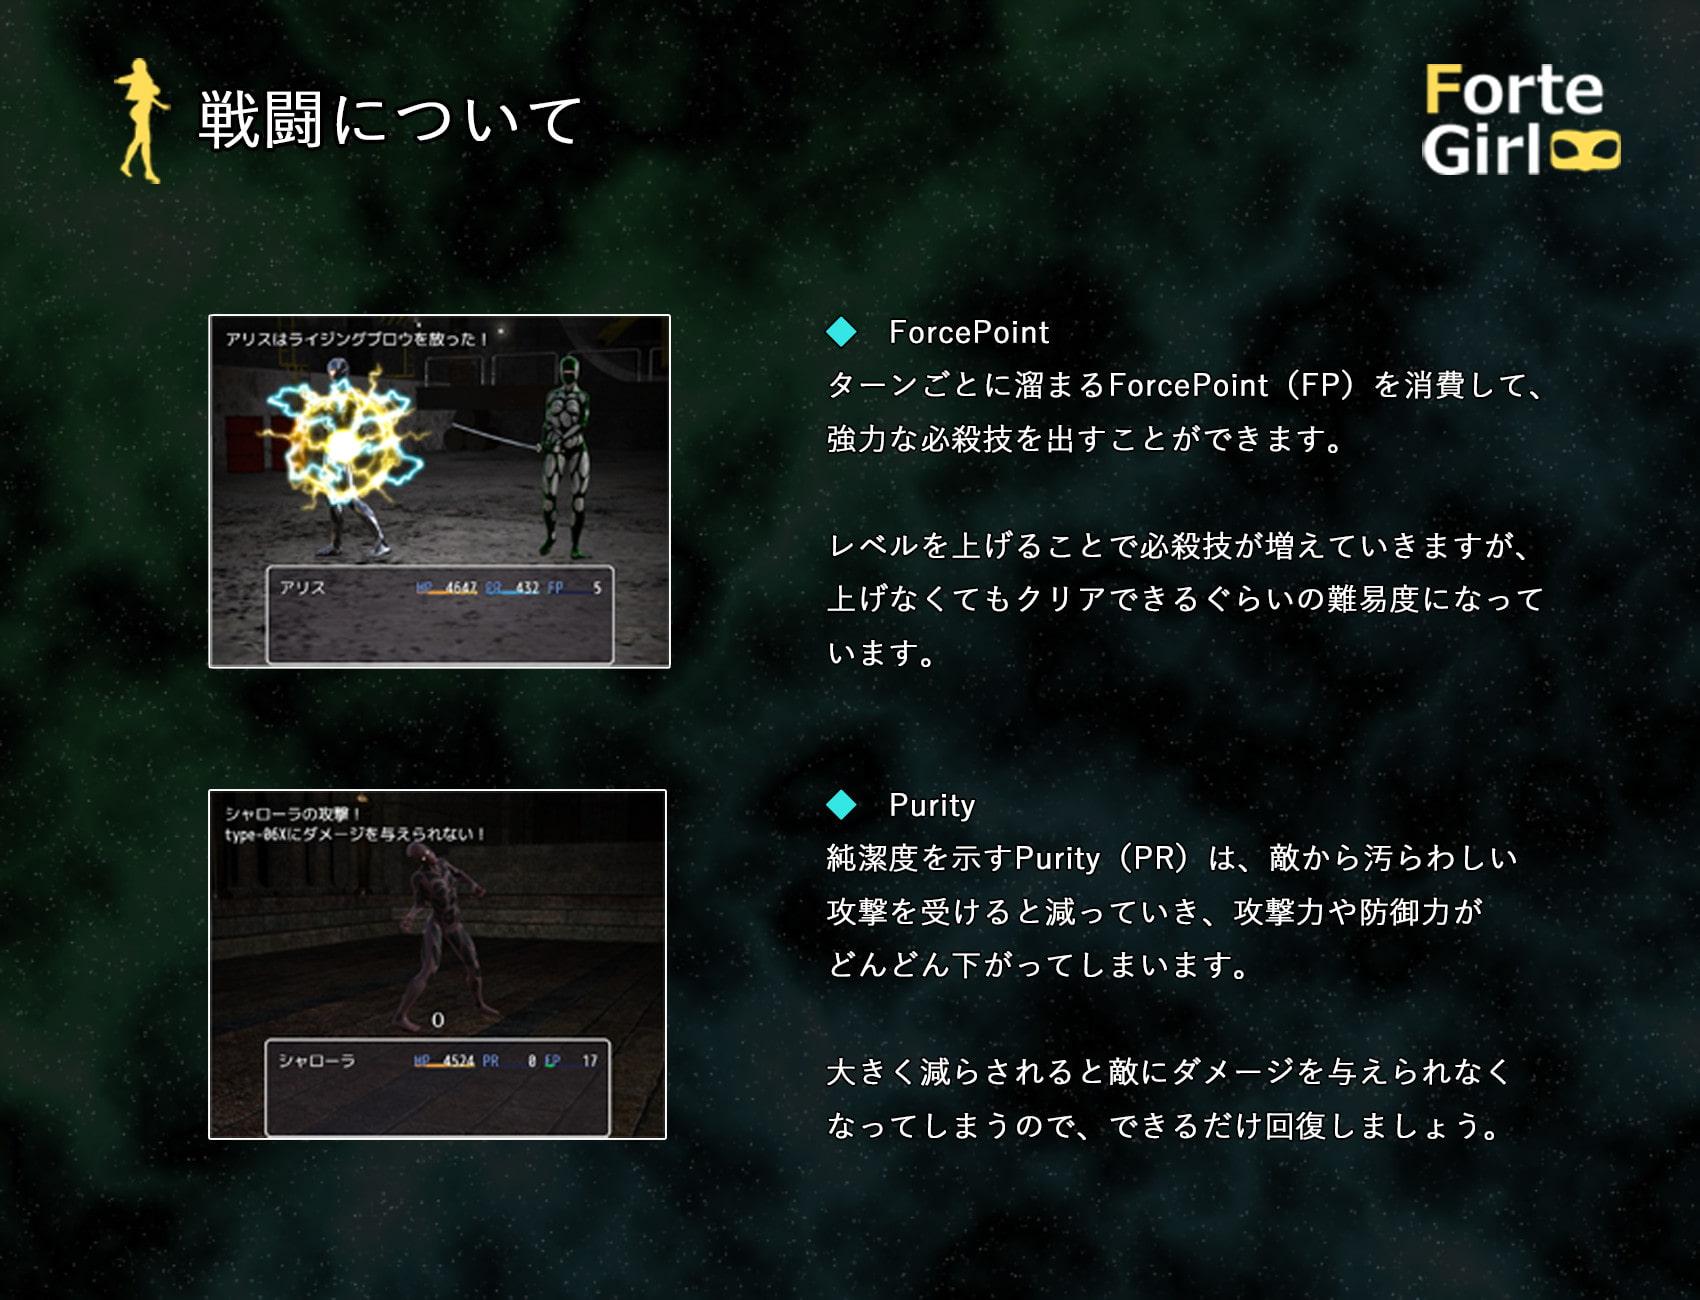 ForteGirl《フォルテガール》5